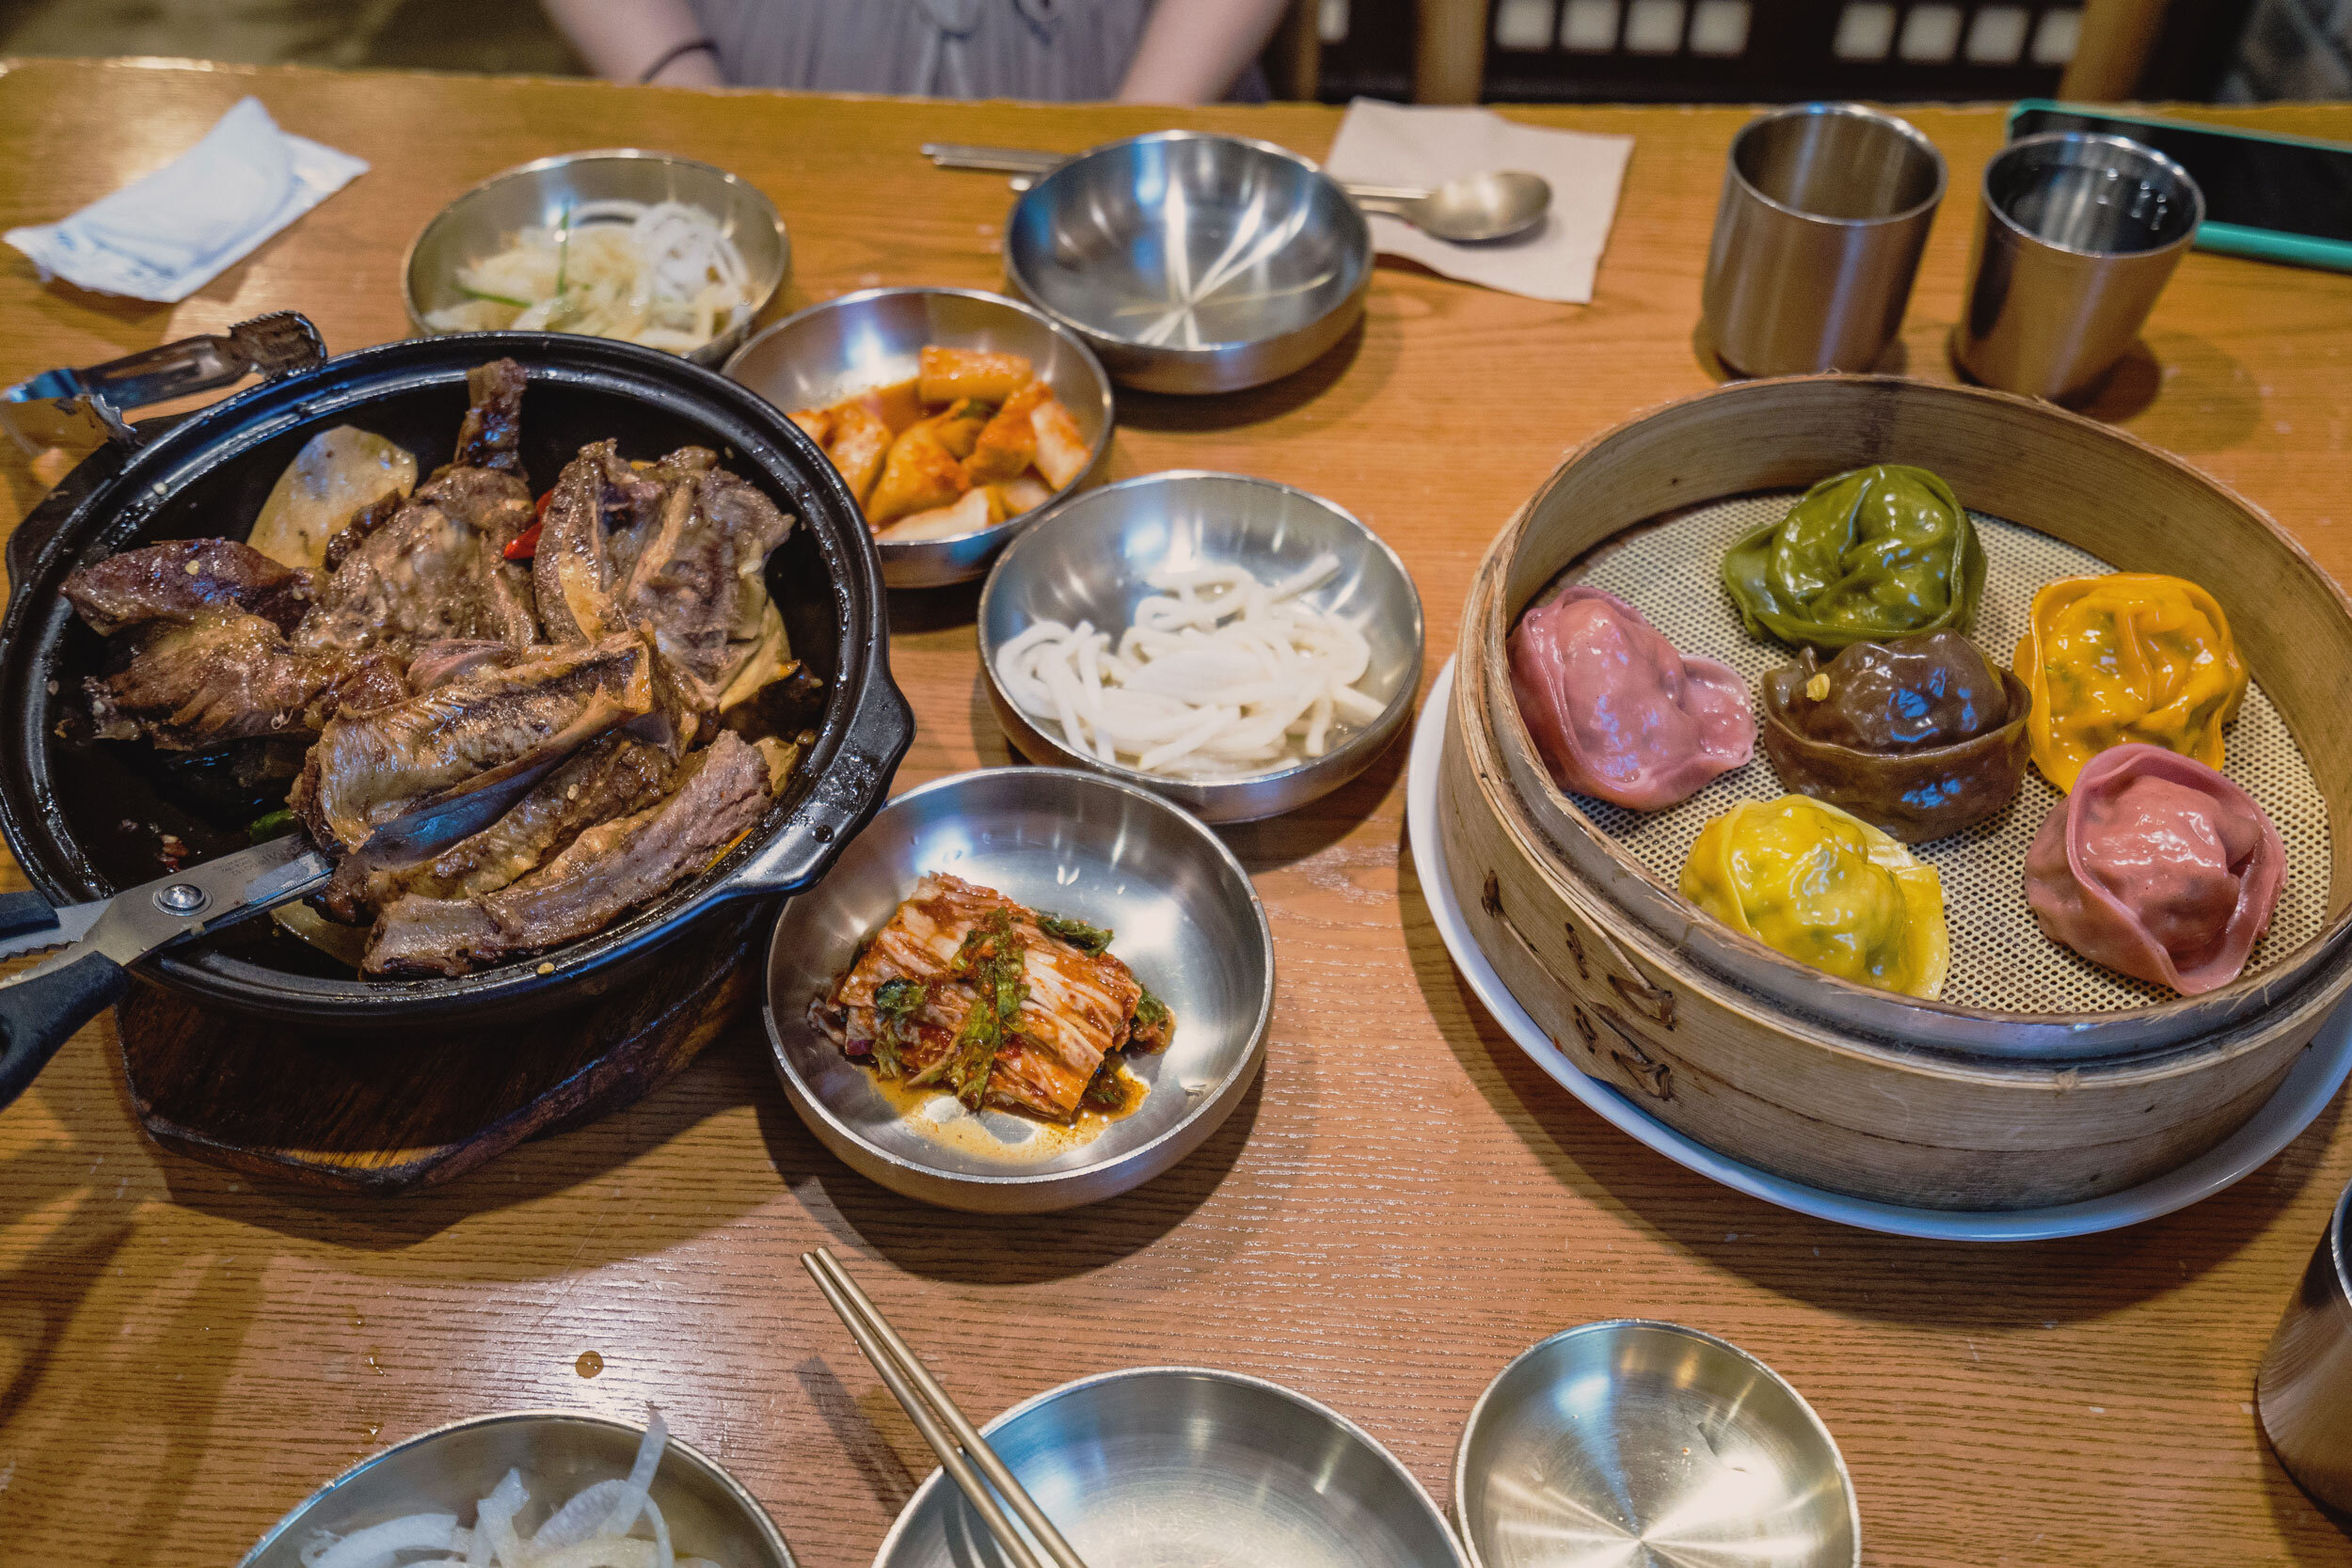 Lunch: Kalbi, colorful mandu, sides